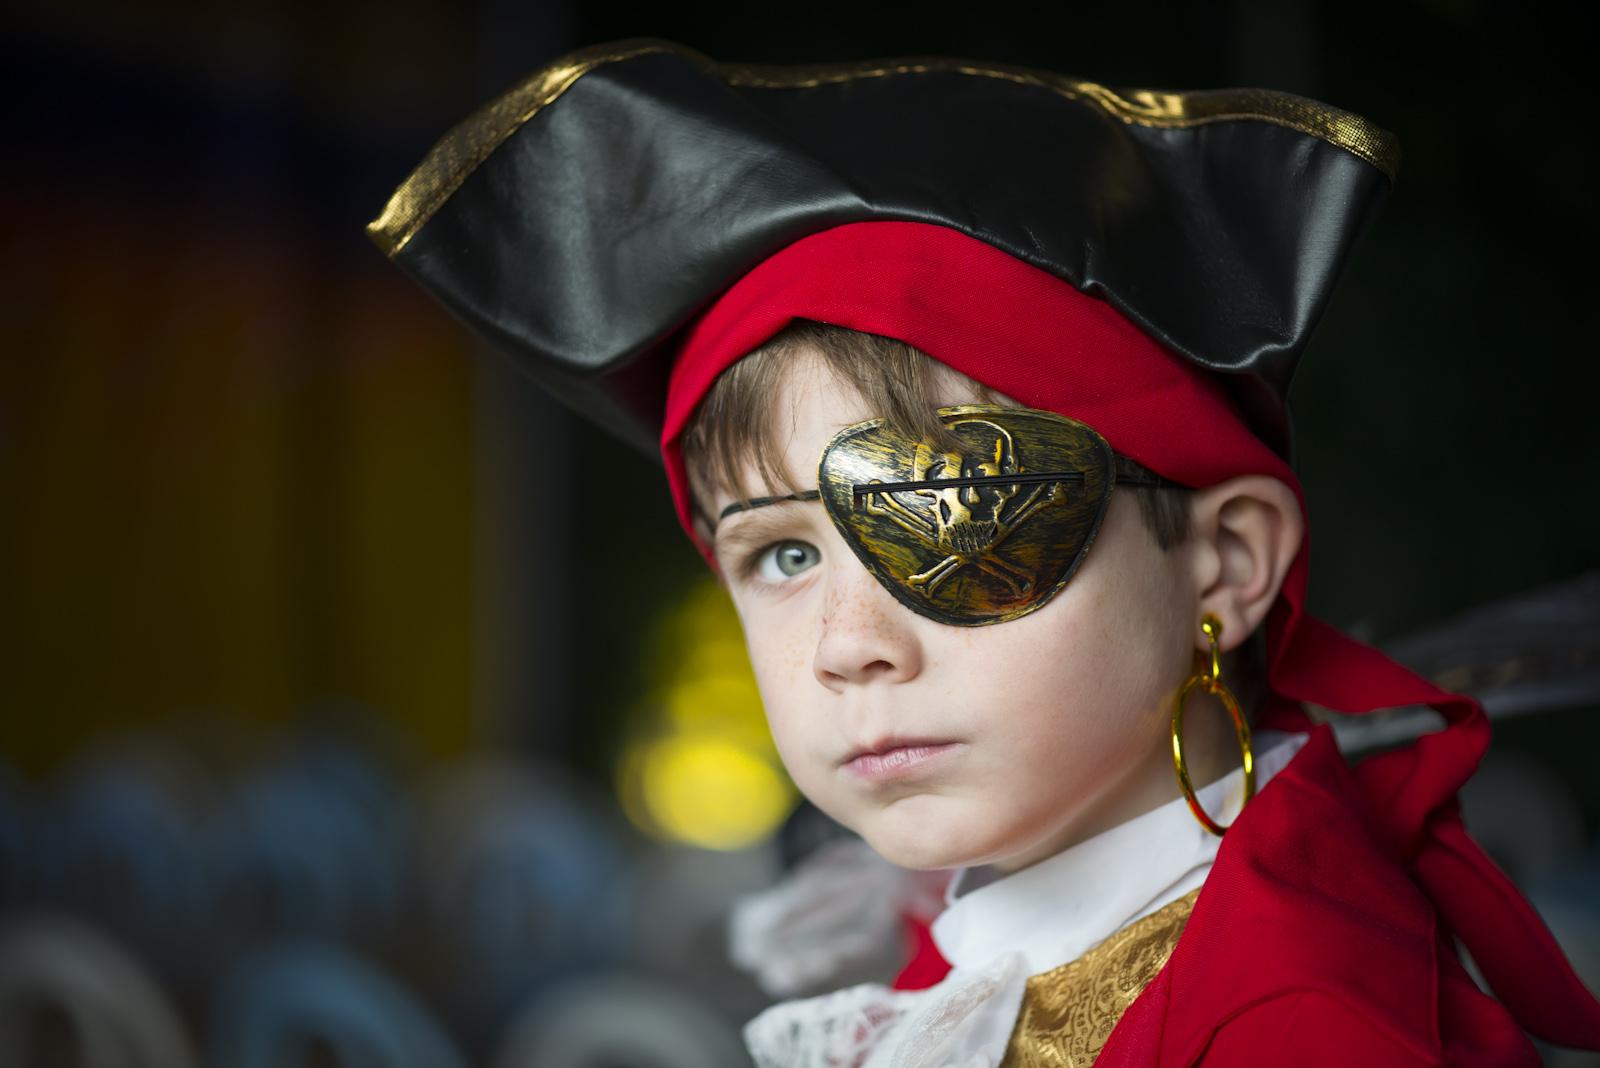 063DSC_6440 boston pirate.jpg